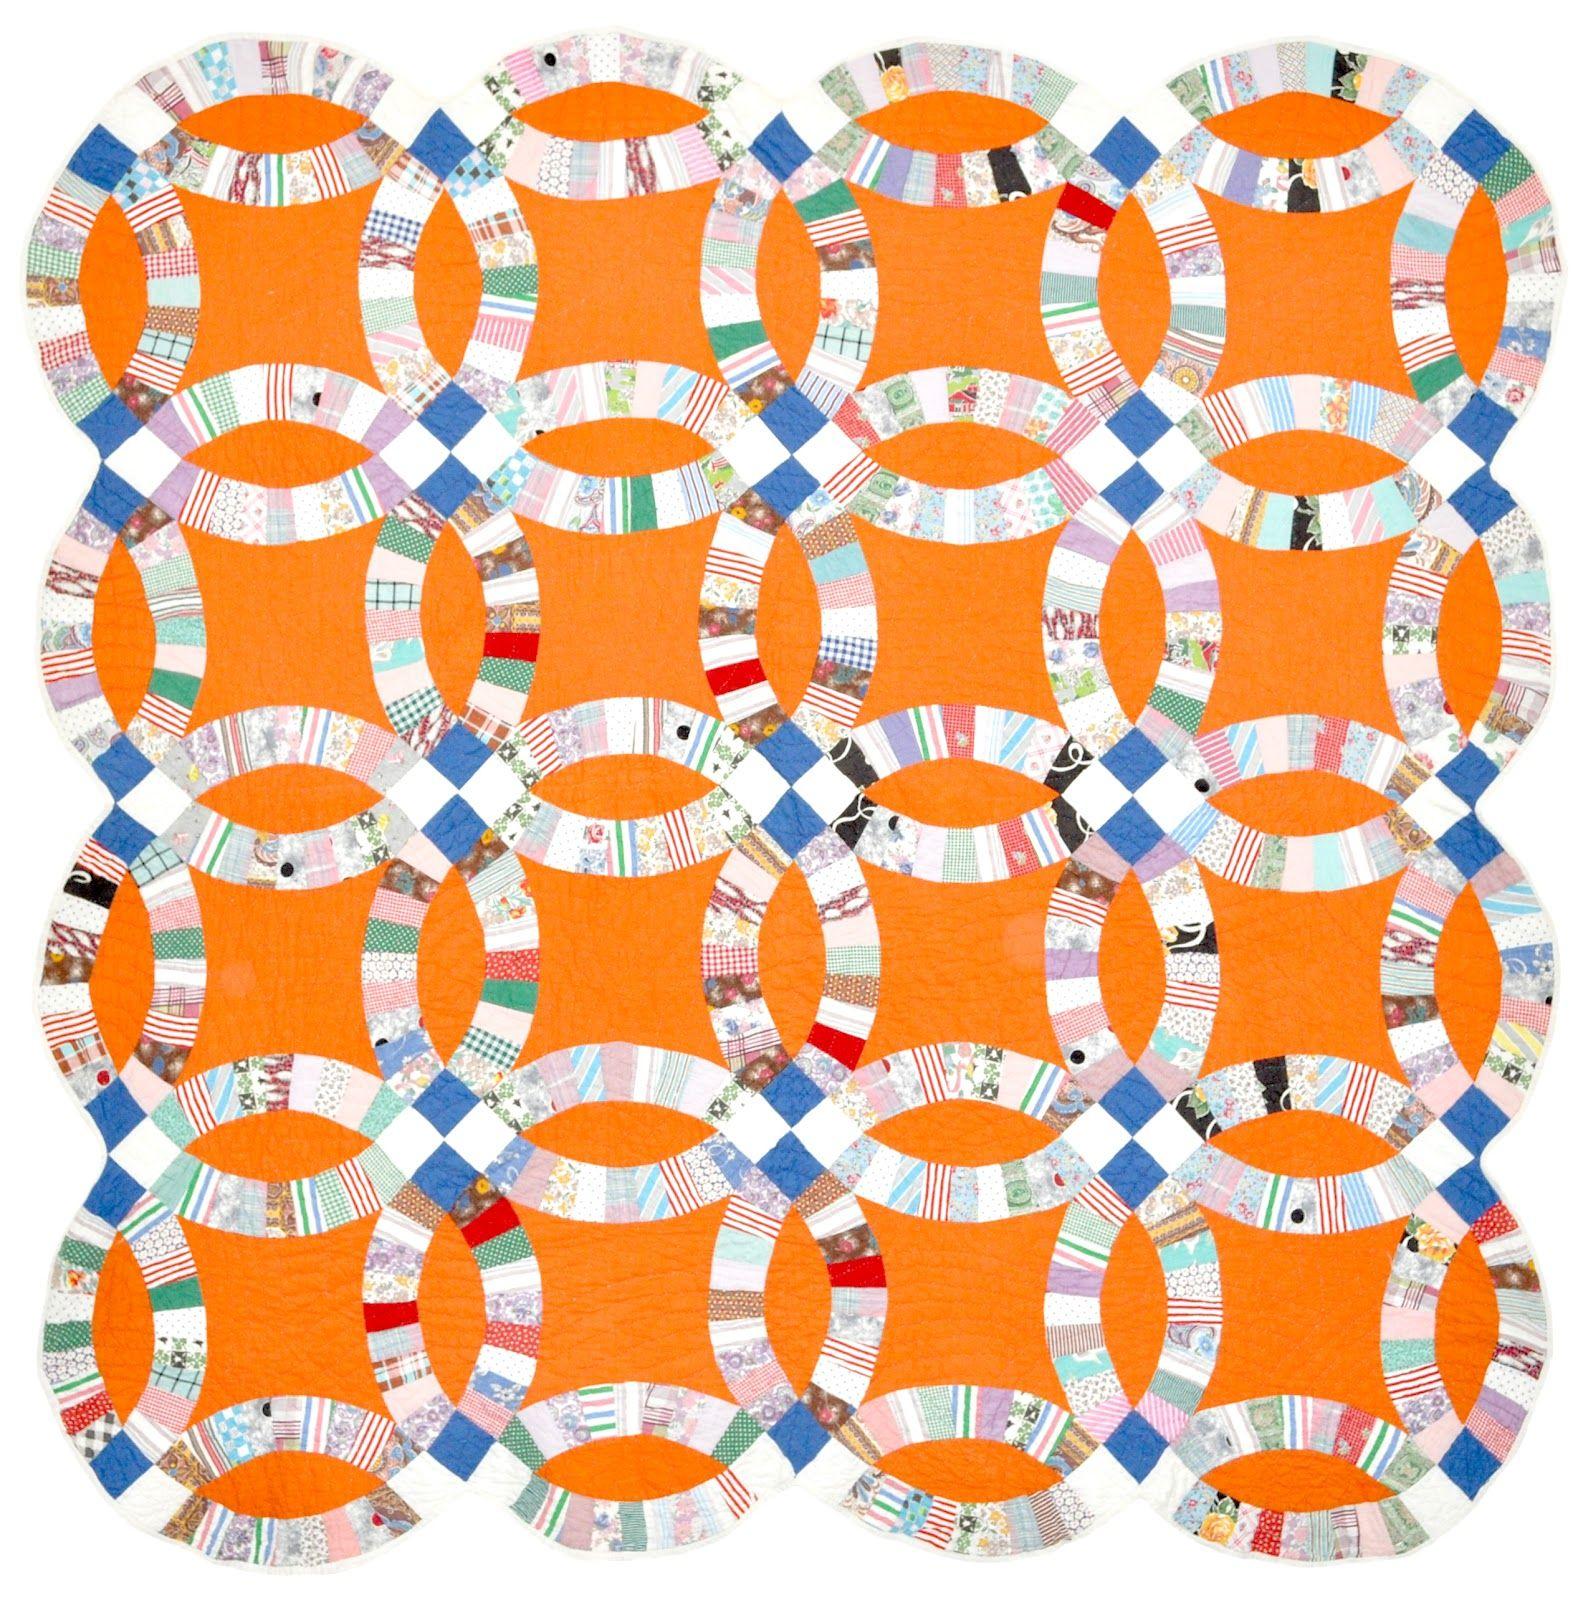 Orange Crush Double wedding ring quilt, c. 1950, posted